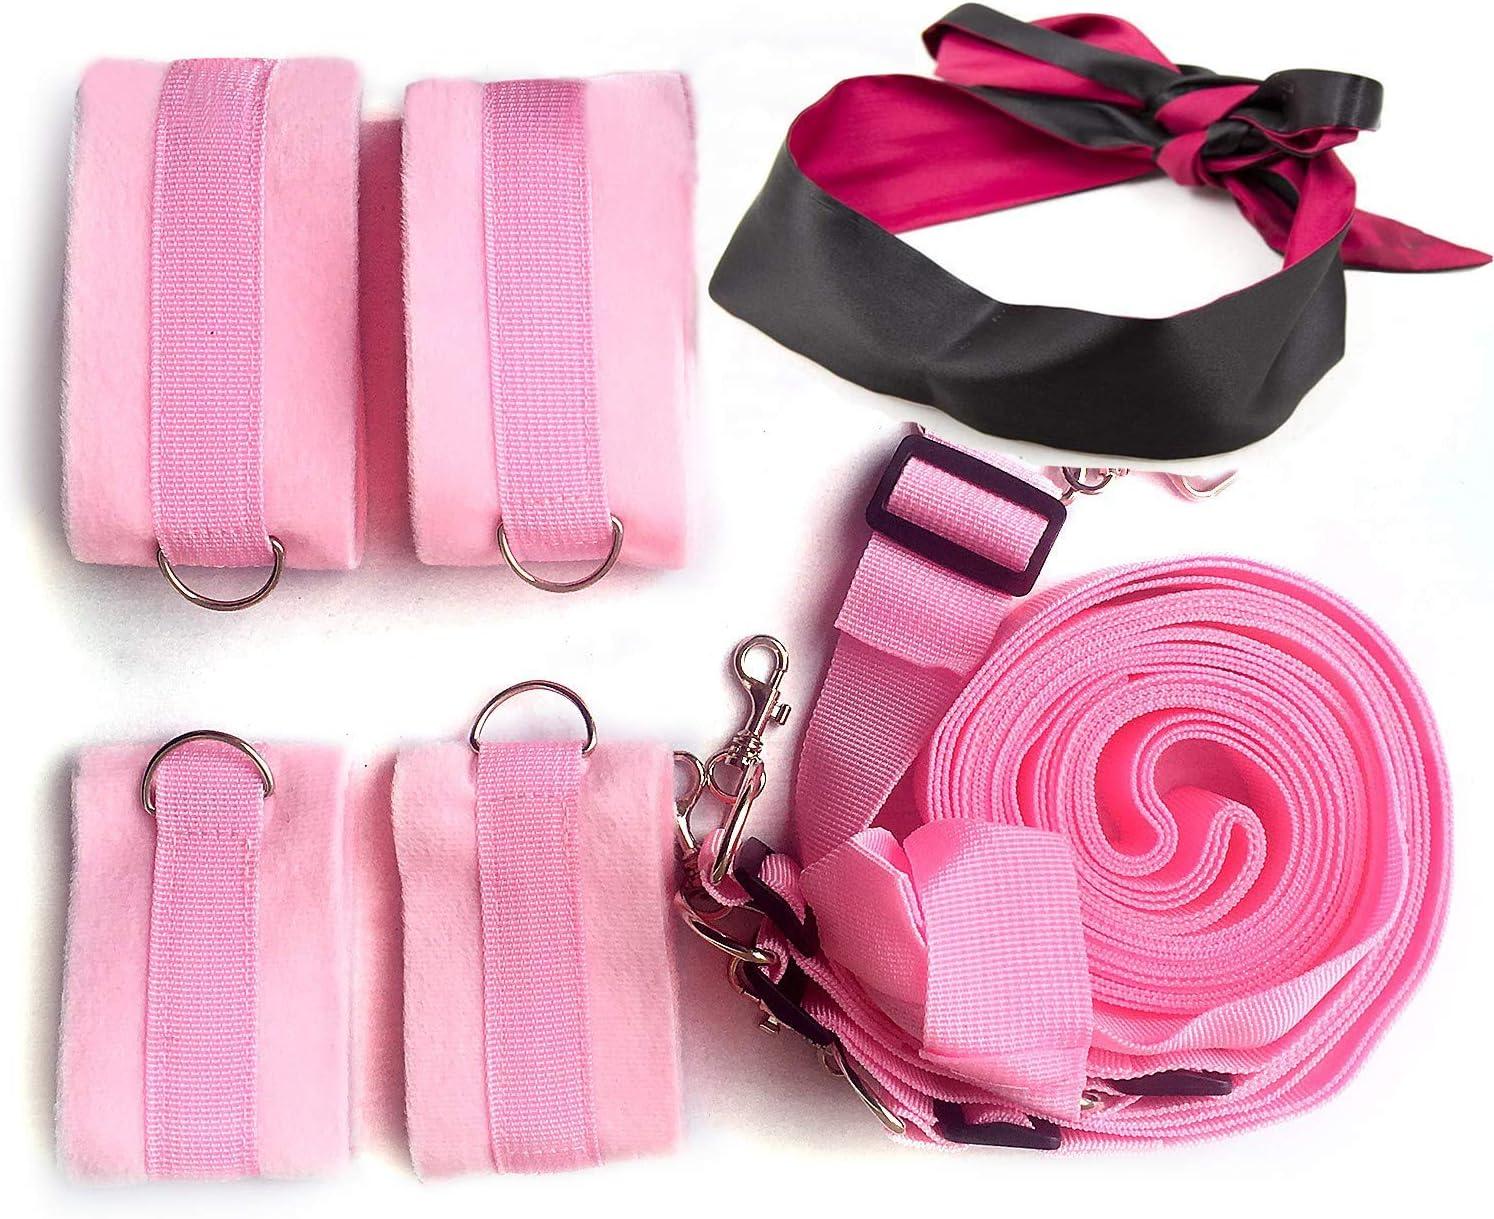 weomgt Womans Bed Tied Str/áps Bedroom Cuffs Set